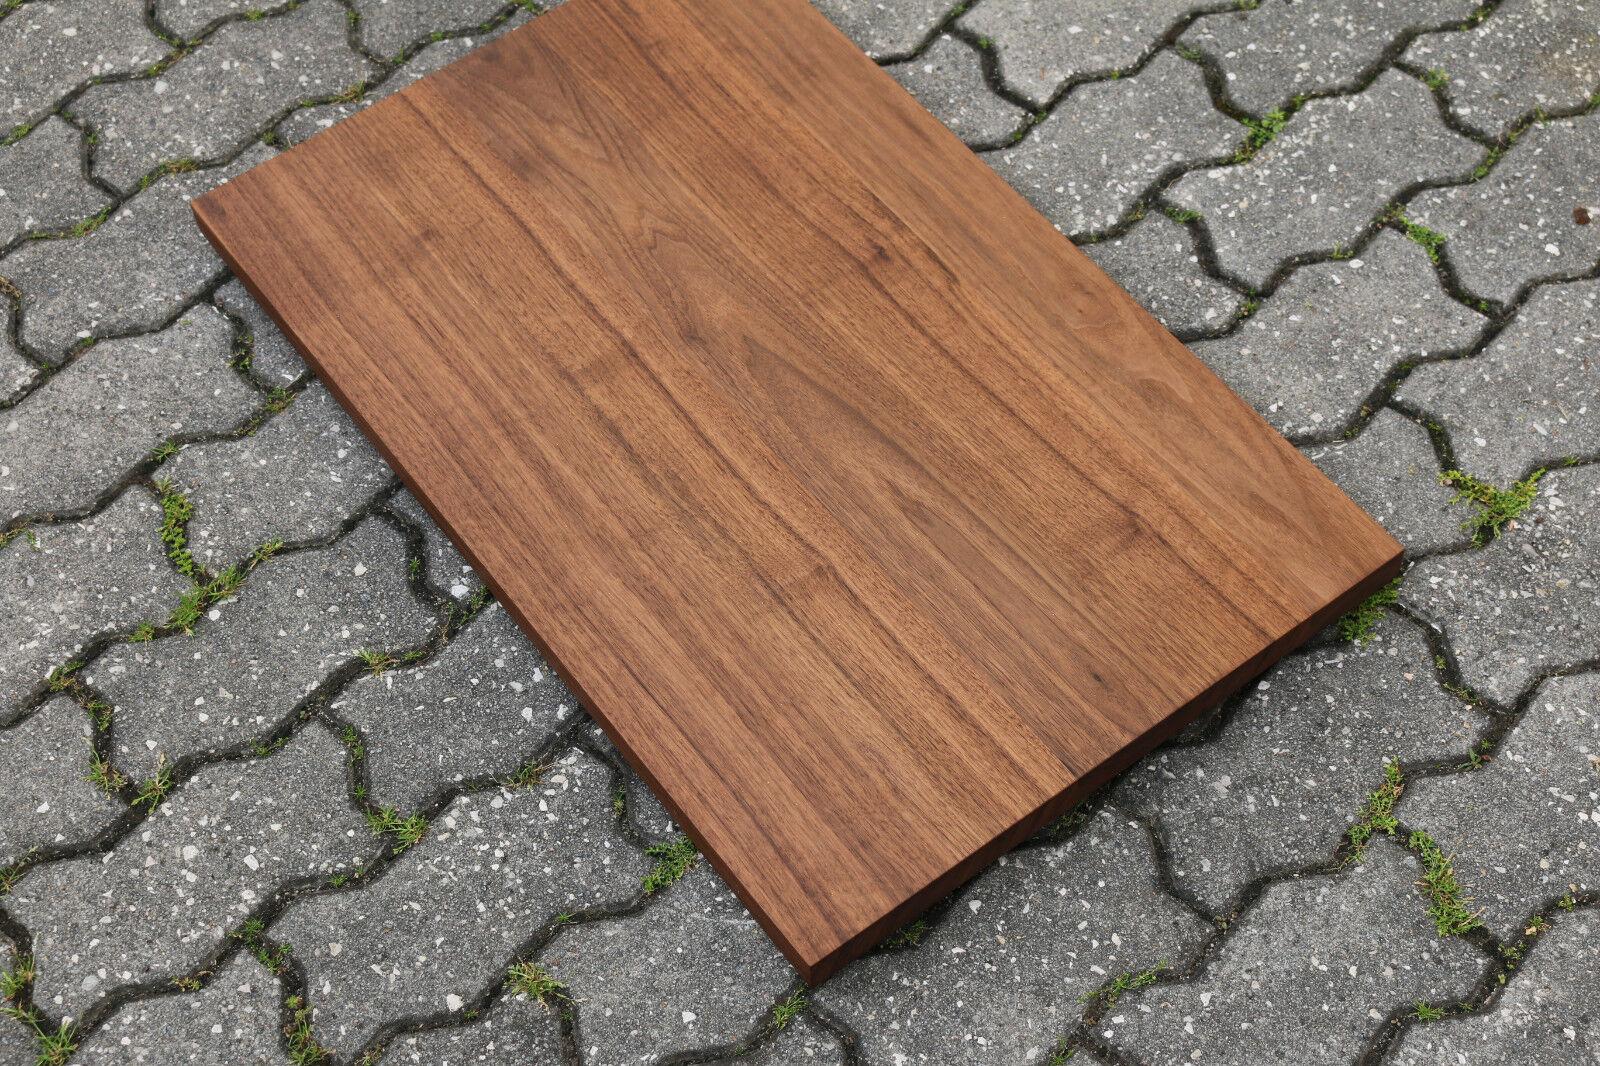 tischplatte platte nussbaum massiv holz neu regalbrett tisch leimholz brett eur 240 00. Black Bedroom Furniture Sets. Home Design Ideas